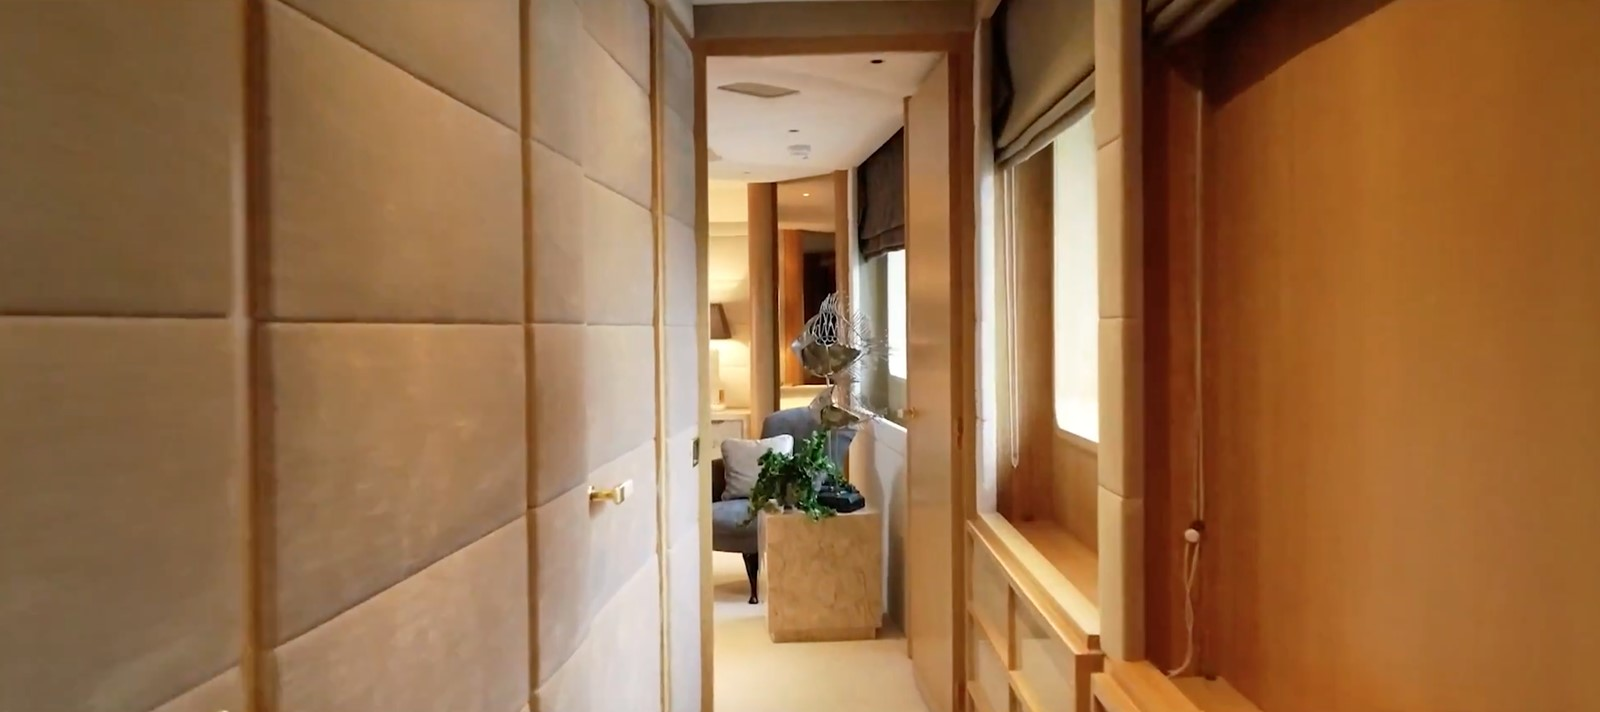 Master Stateroom Hallway - 162 OCEANCO For Sale